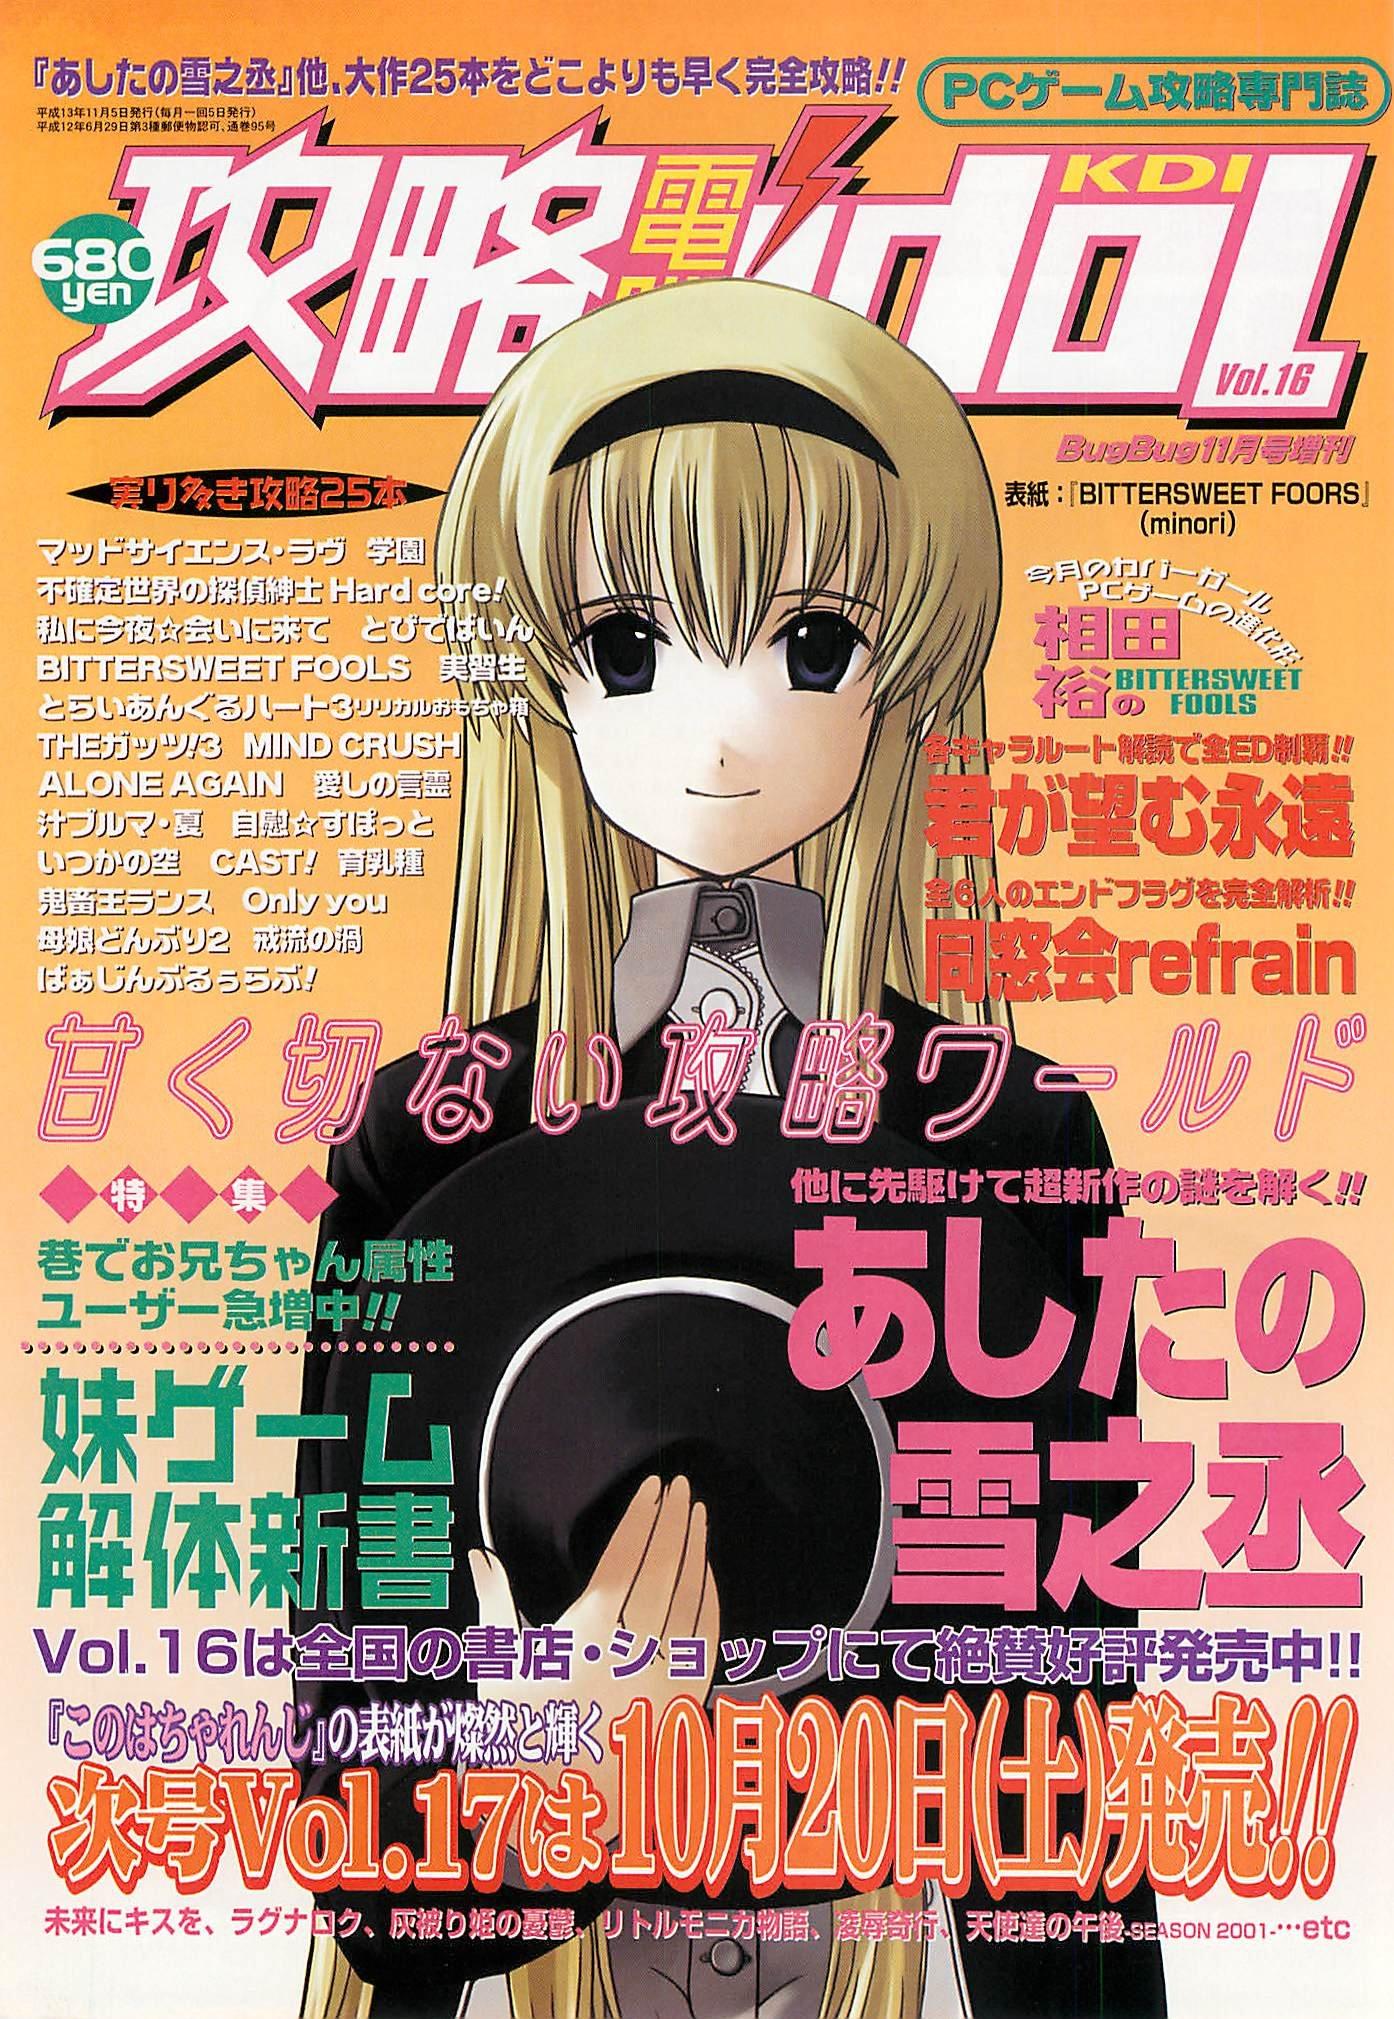 Kouryaku Dennou idol Vol.16 (November 2001) ad